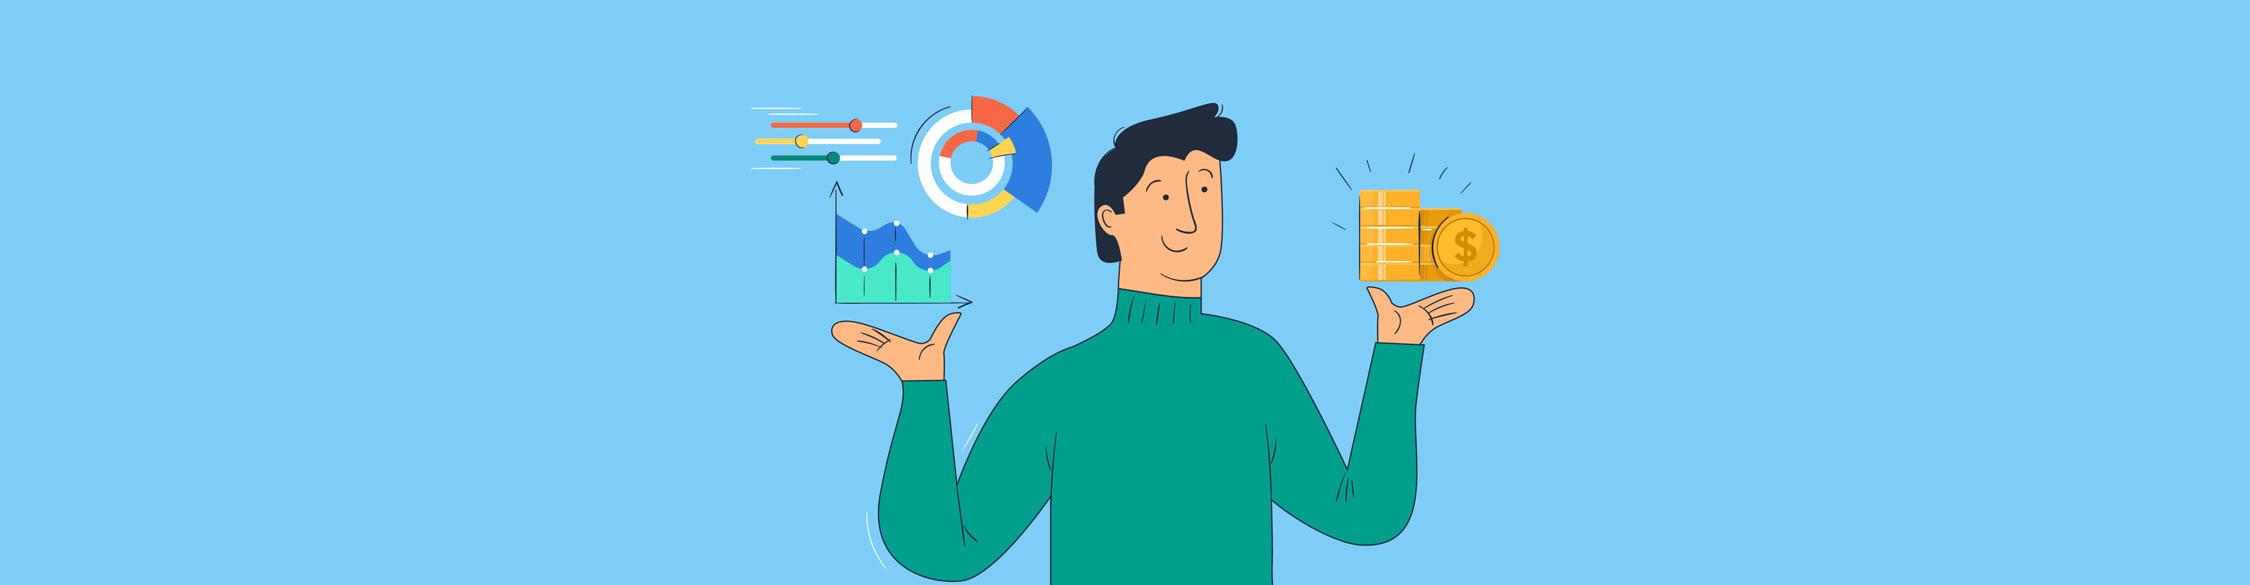 data visualization startup funding - header